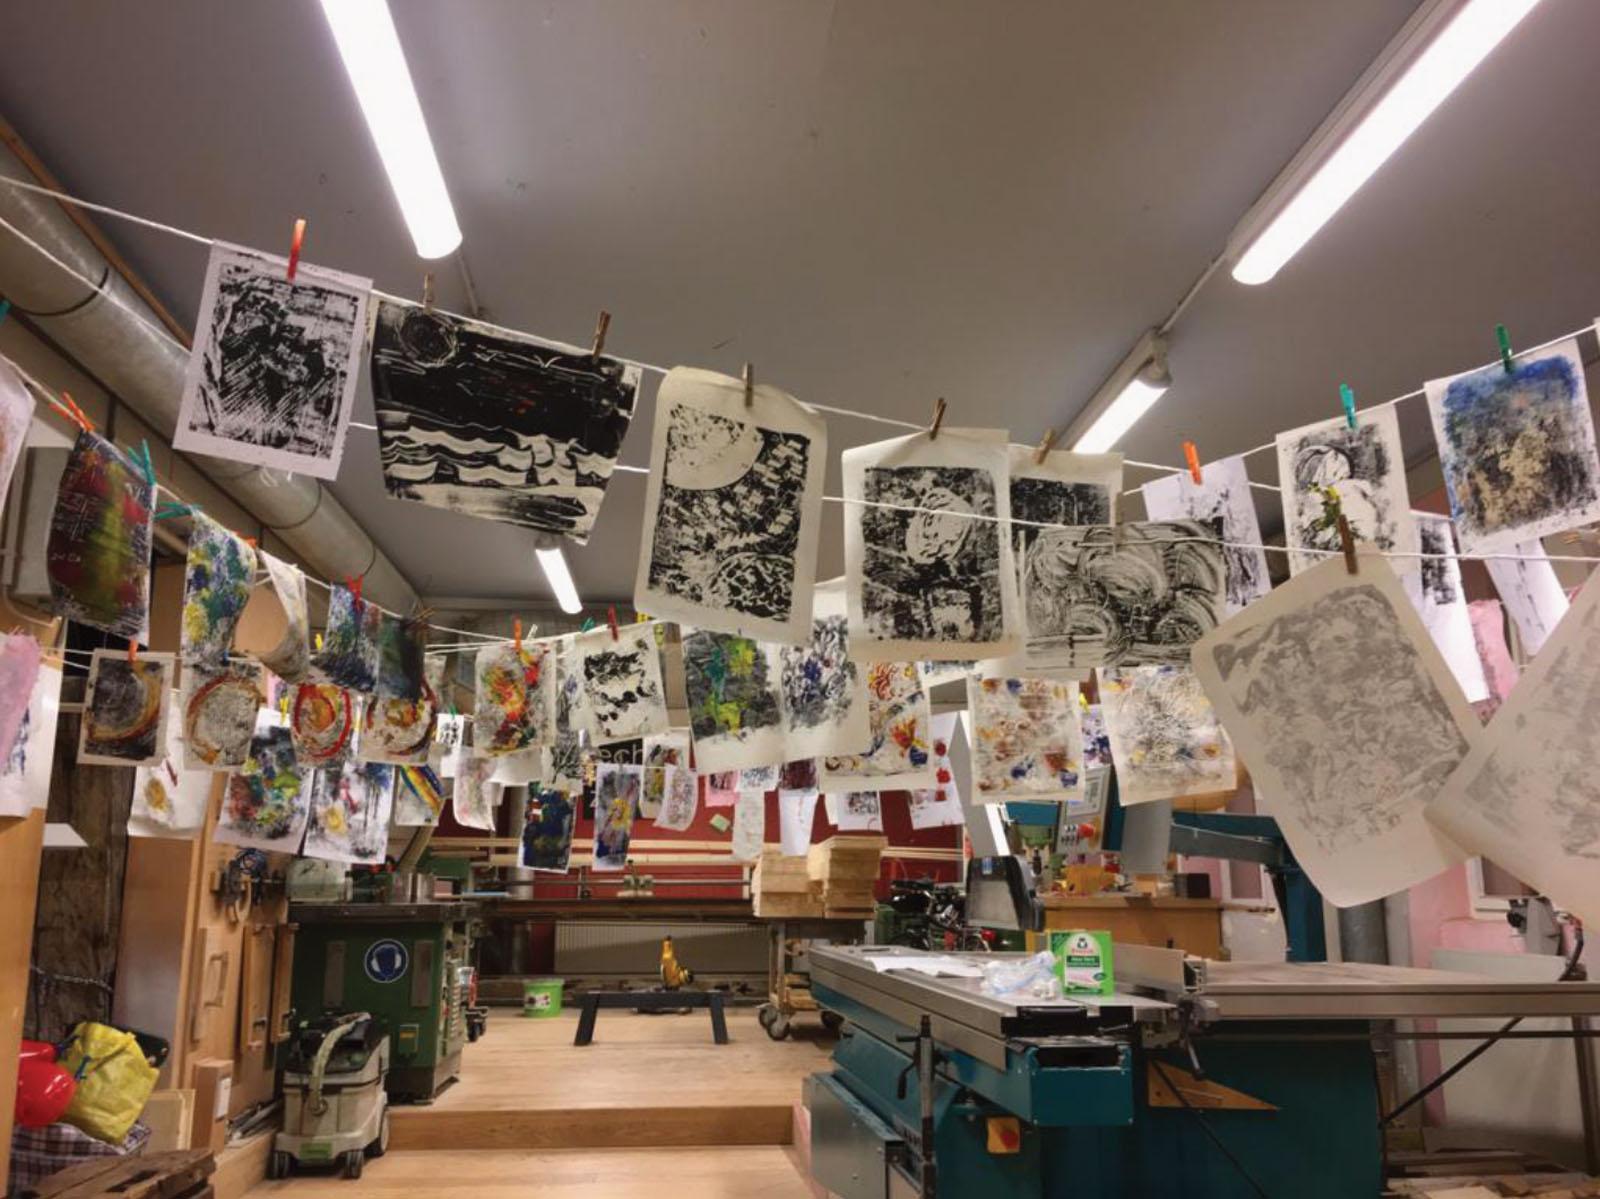 Lange Nacht der Museen Stuttgart - Kuenstlergruppe Experiment